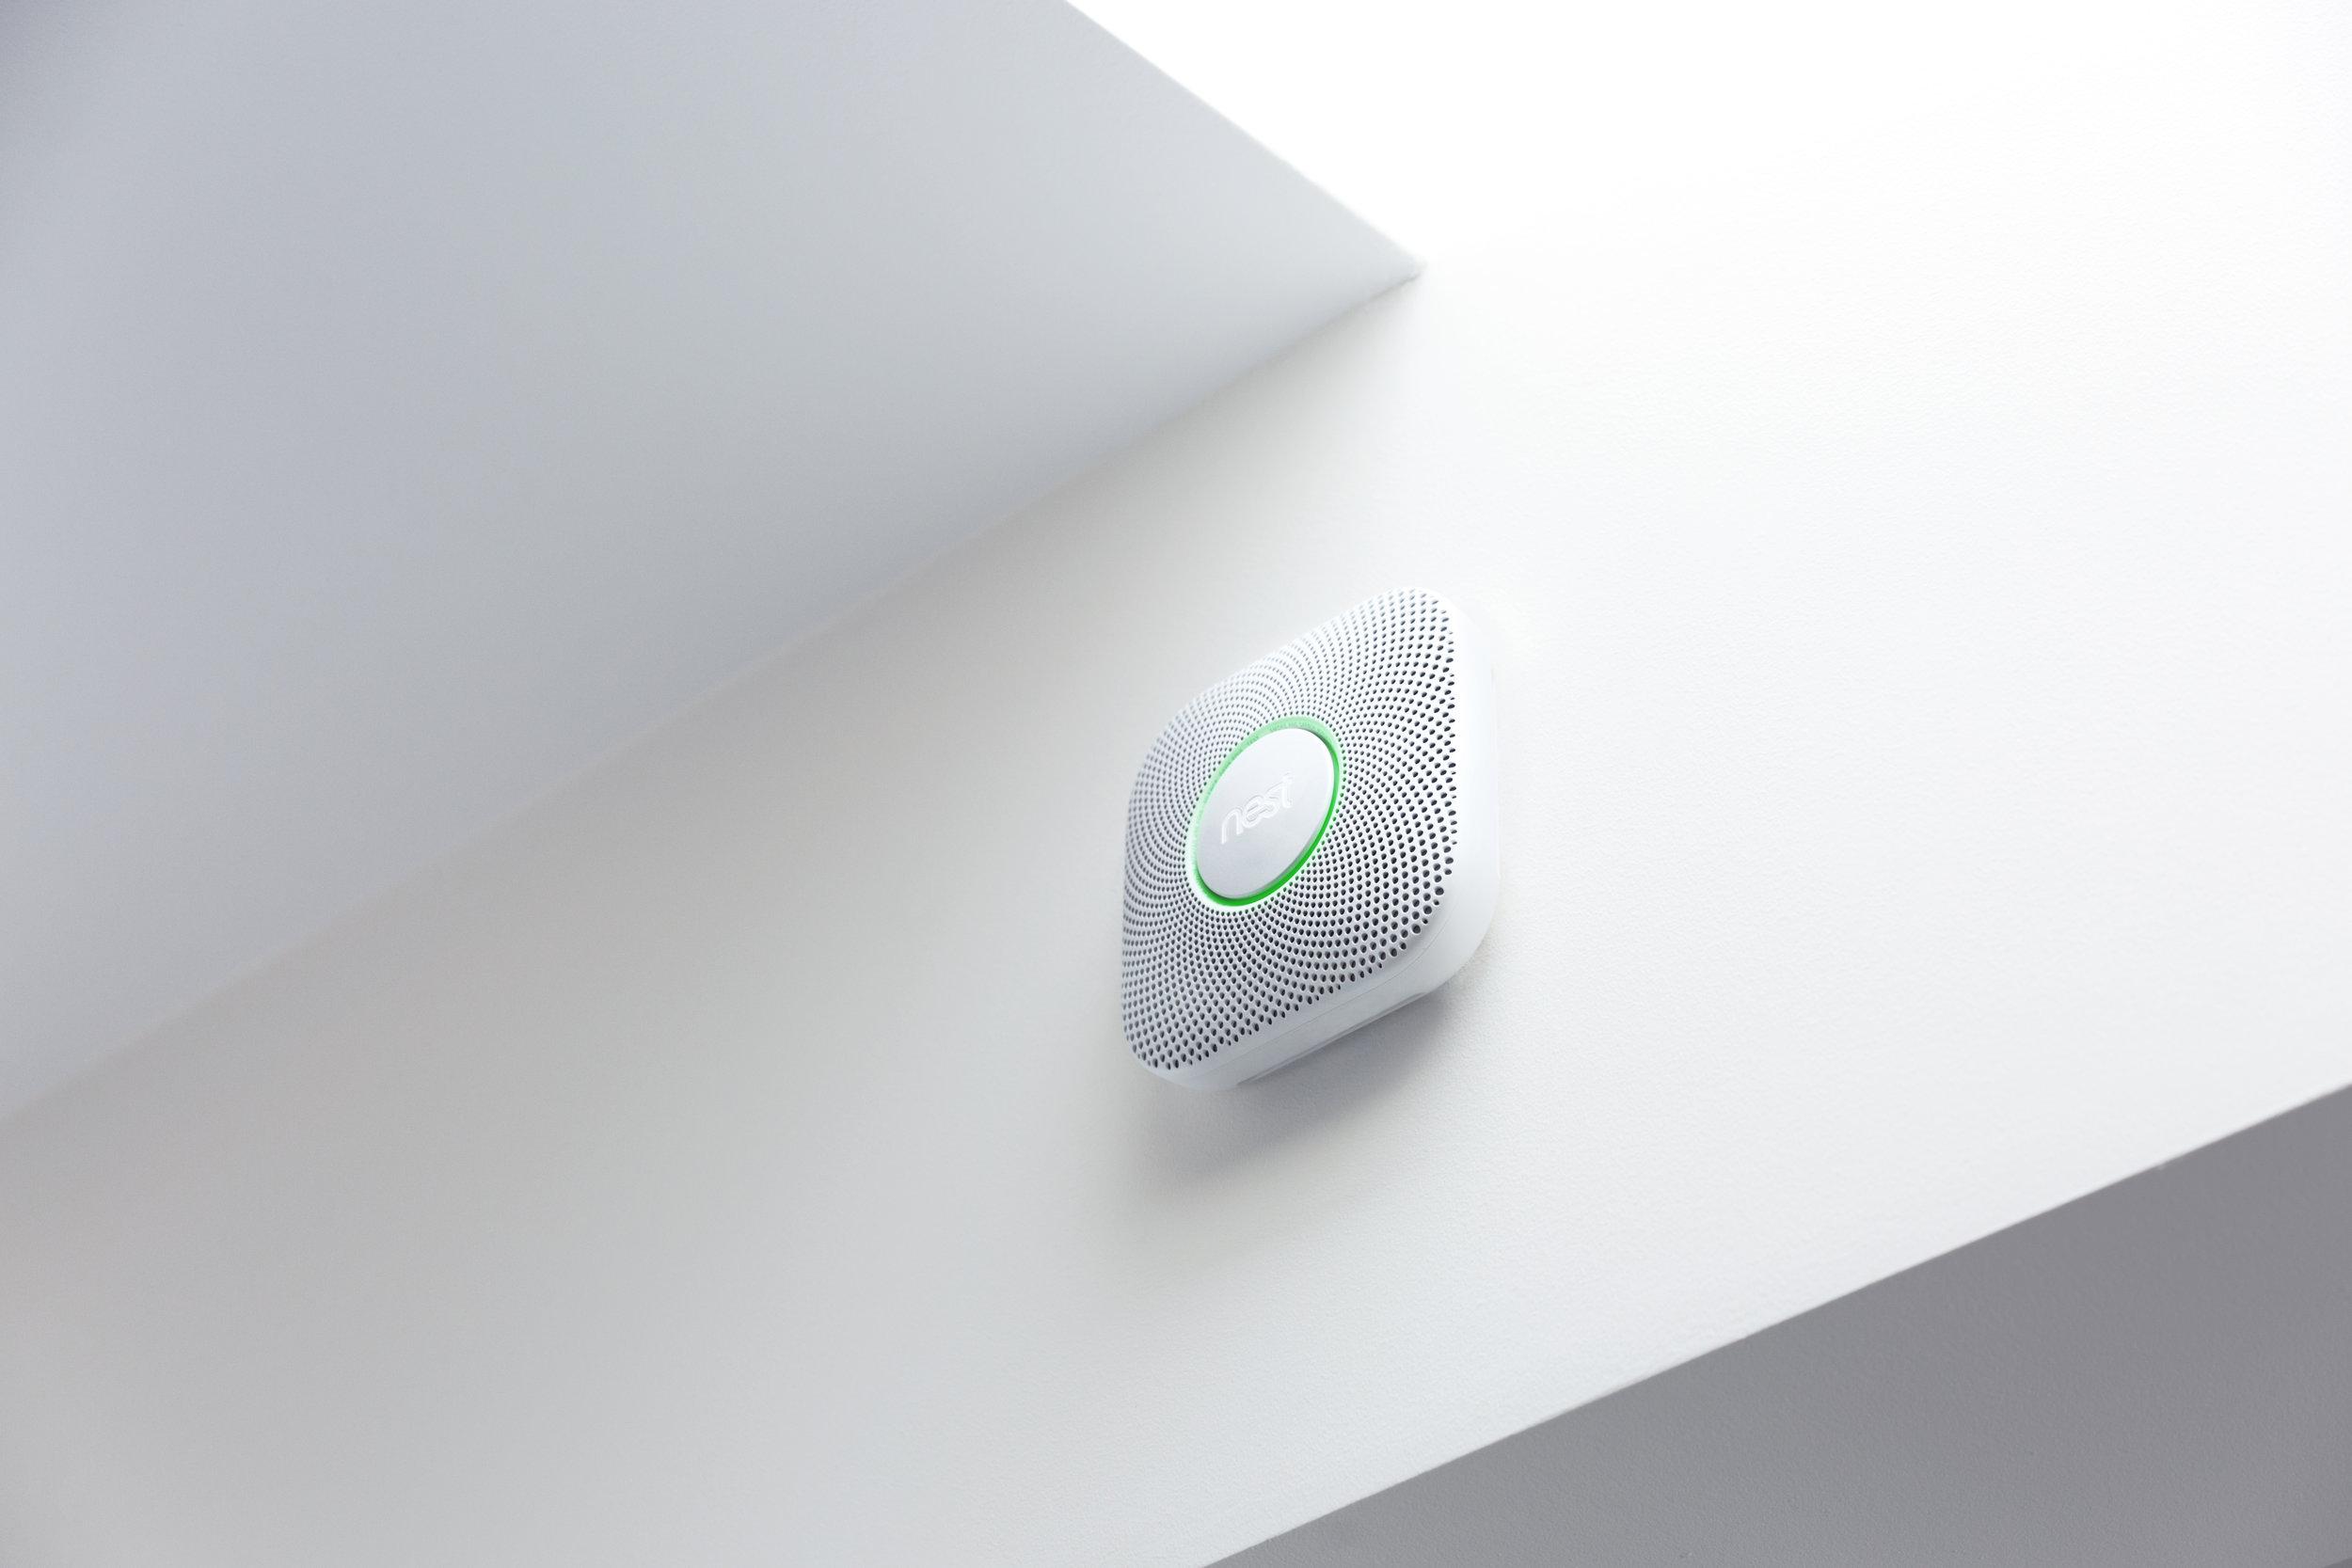 Nest_home_Nopa_protect_2_11534_v03 copy.jpg